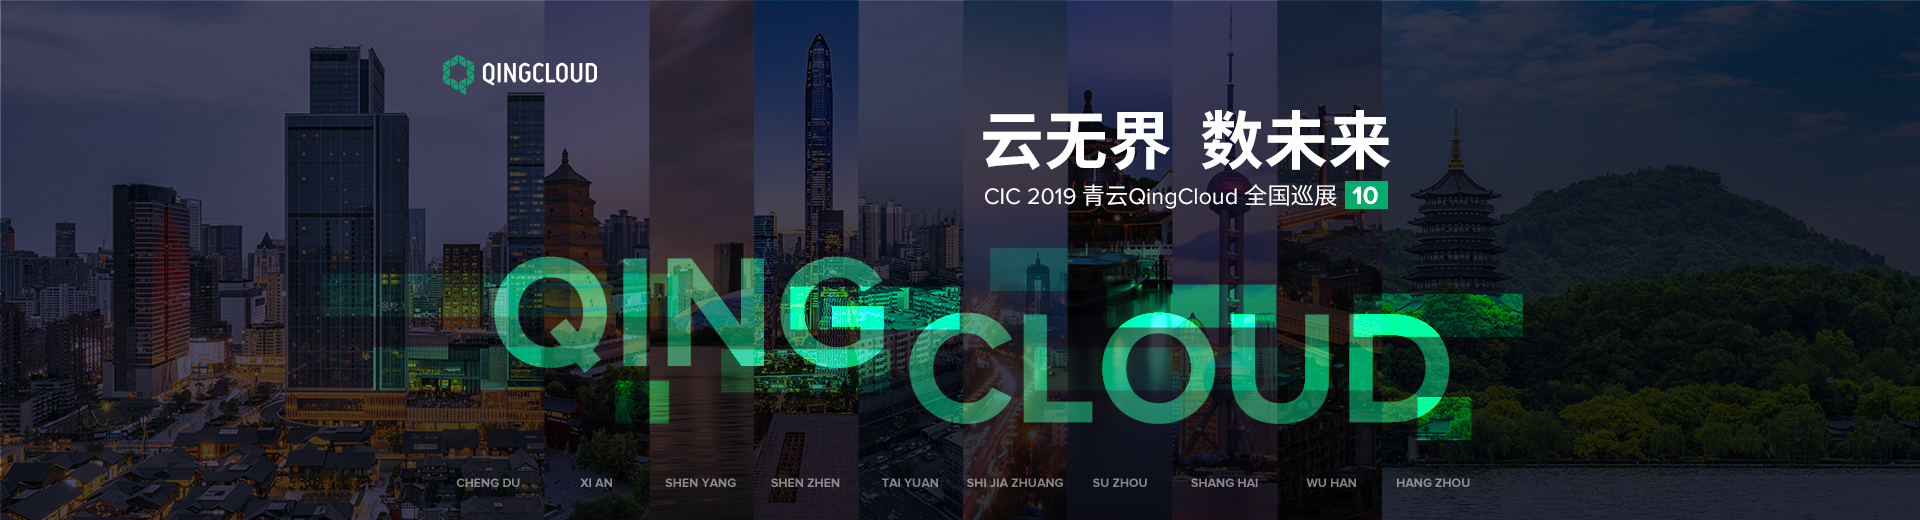 CIC 2019 青云QingCloud 全国巡展